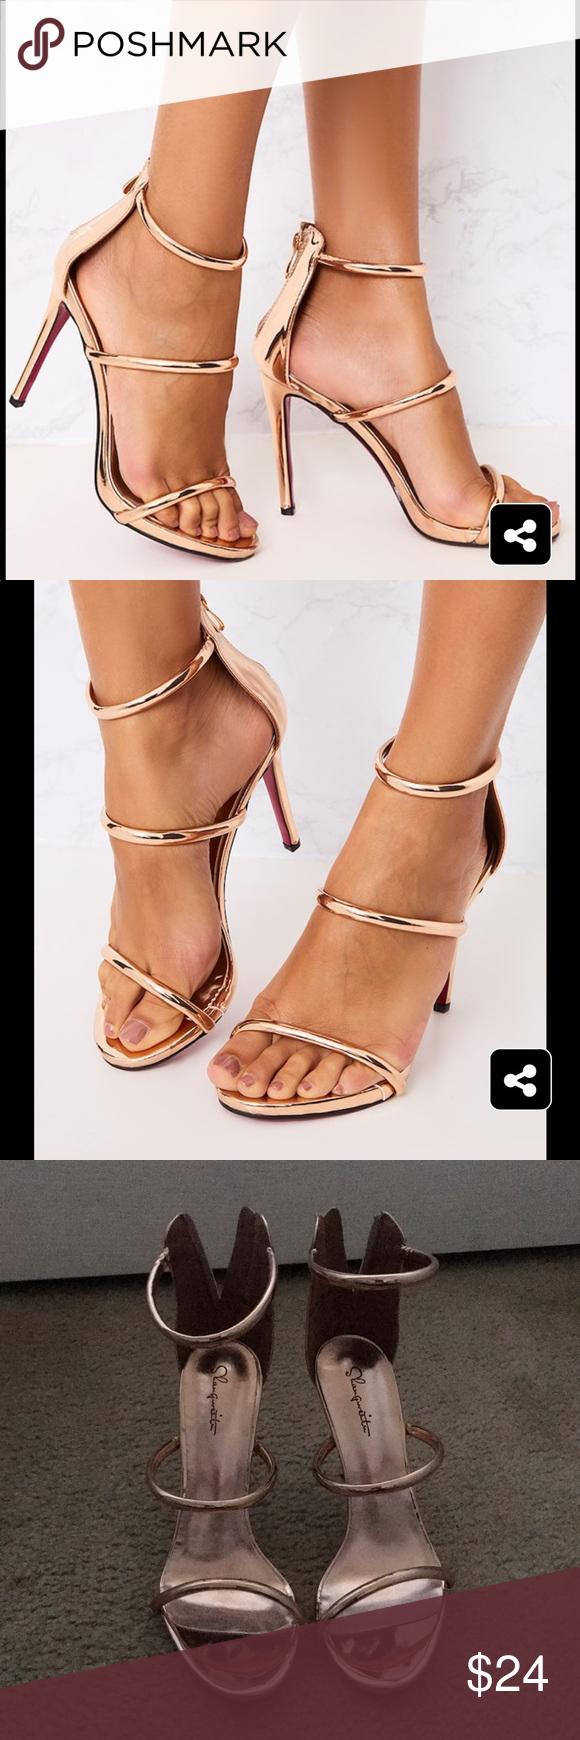 21b84d5aa20 Marthea Rose Gold Tube Strap Heeled Sandals Never worn rose gold ...